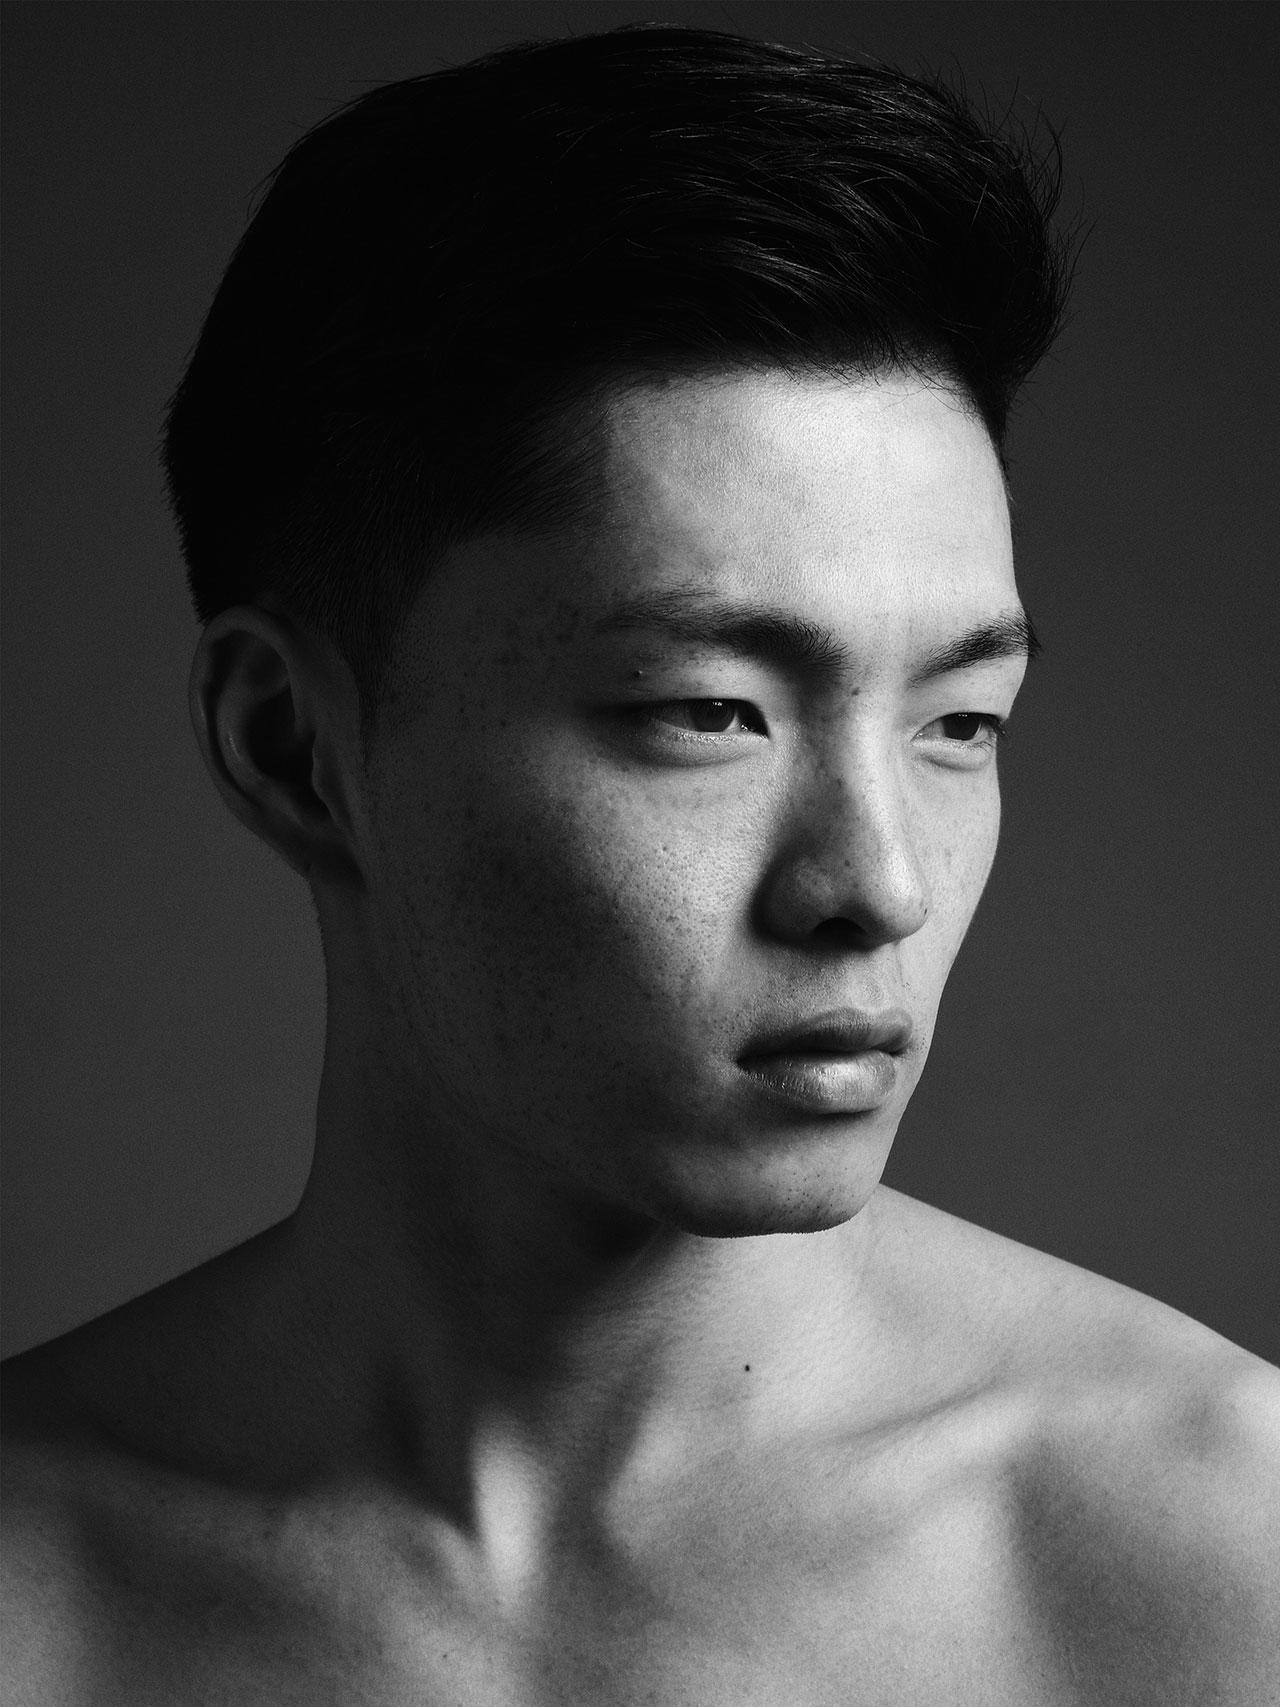 Asian male fashion models